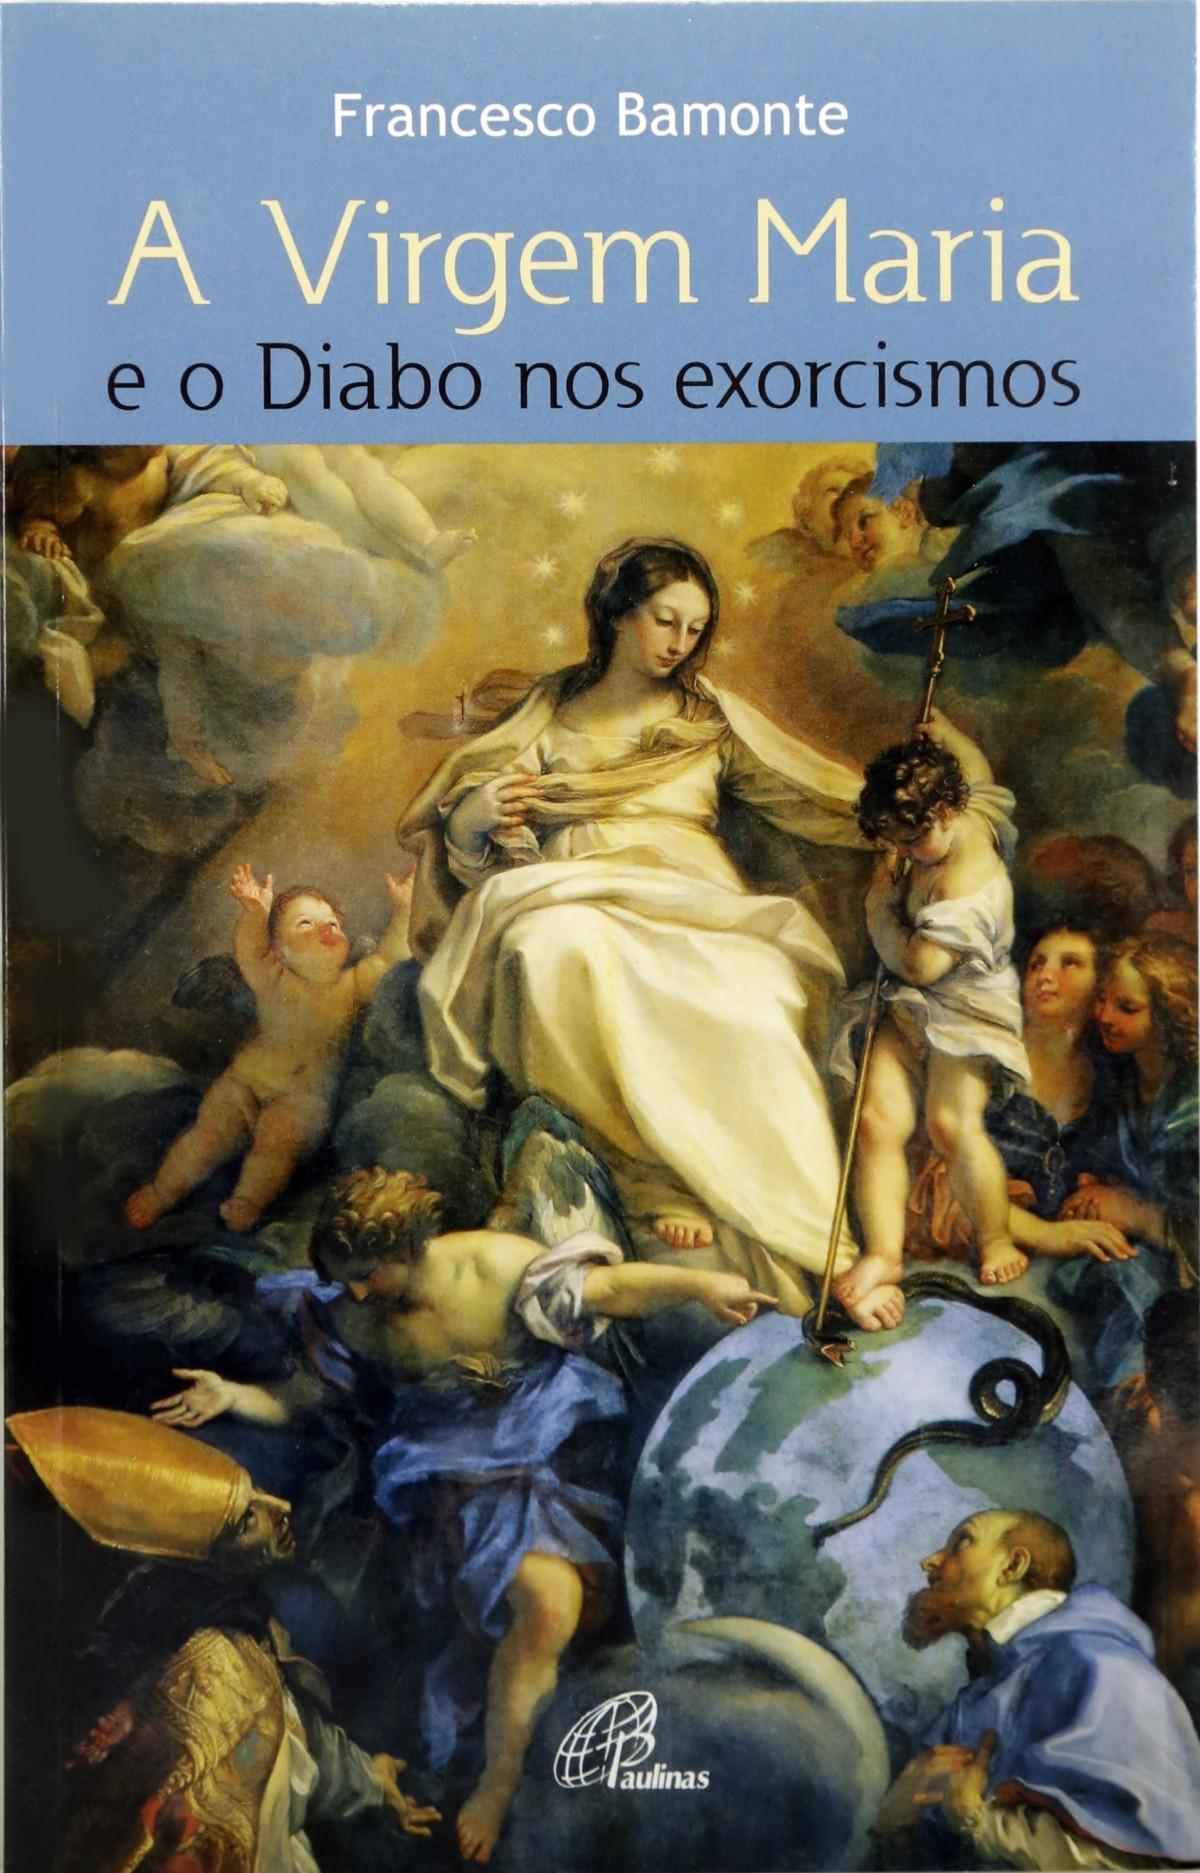 Foto 1 - A Virgem Maria e o Diabo